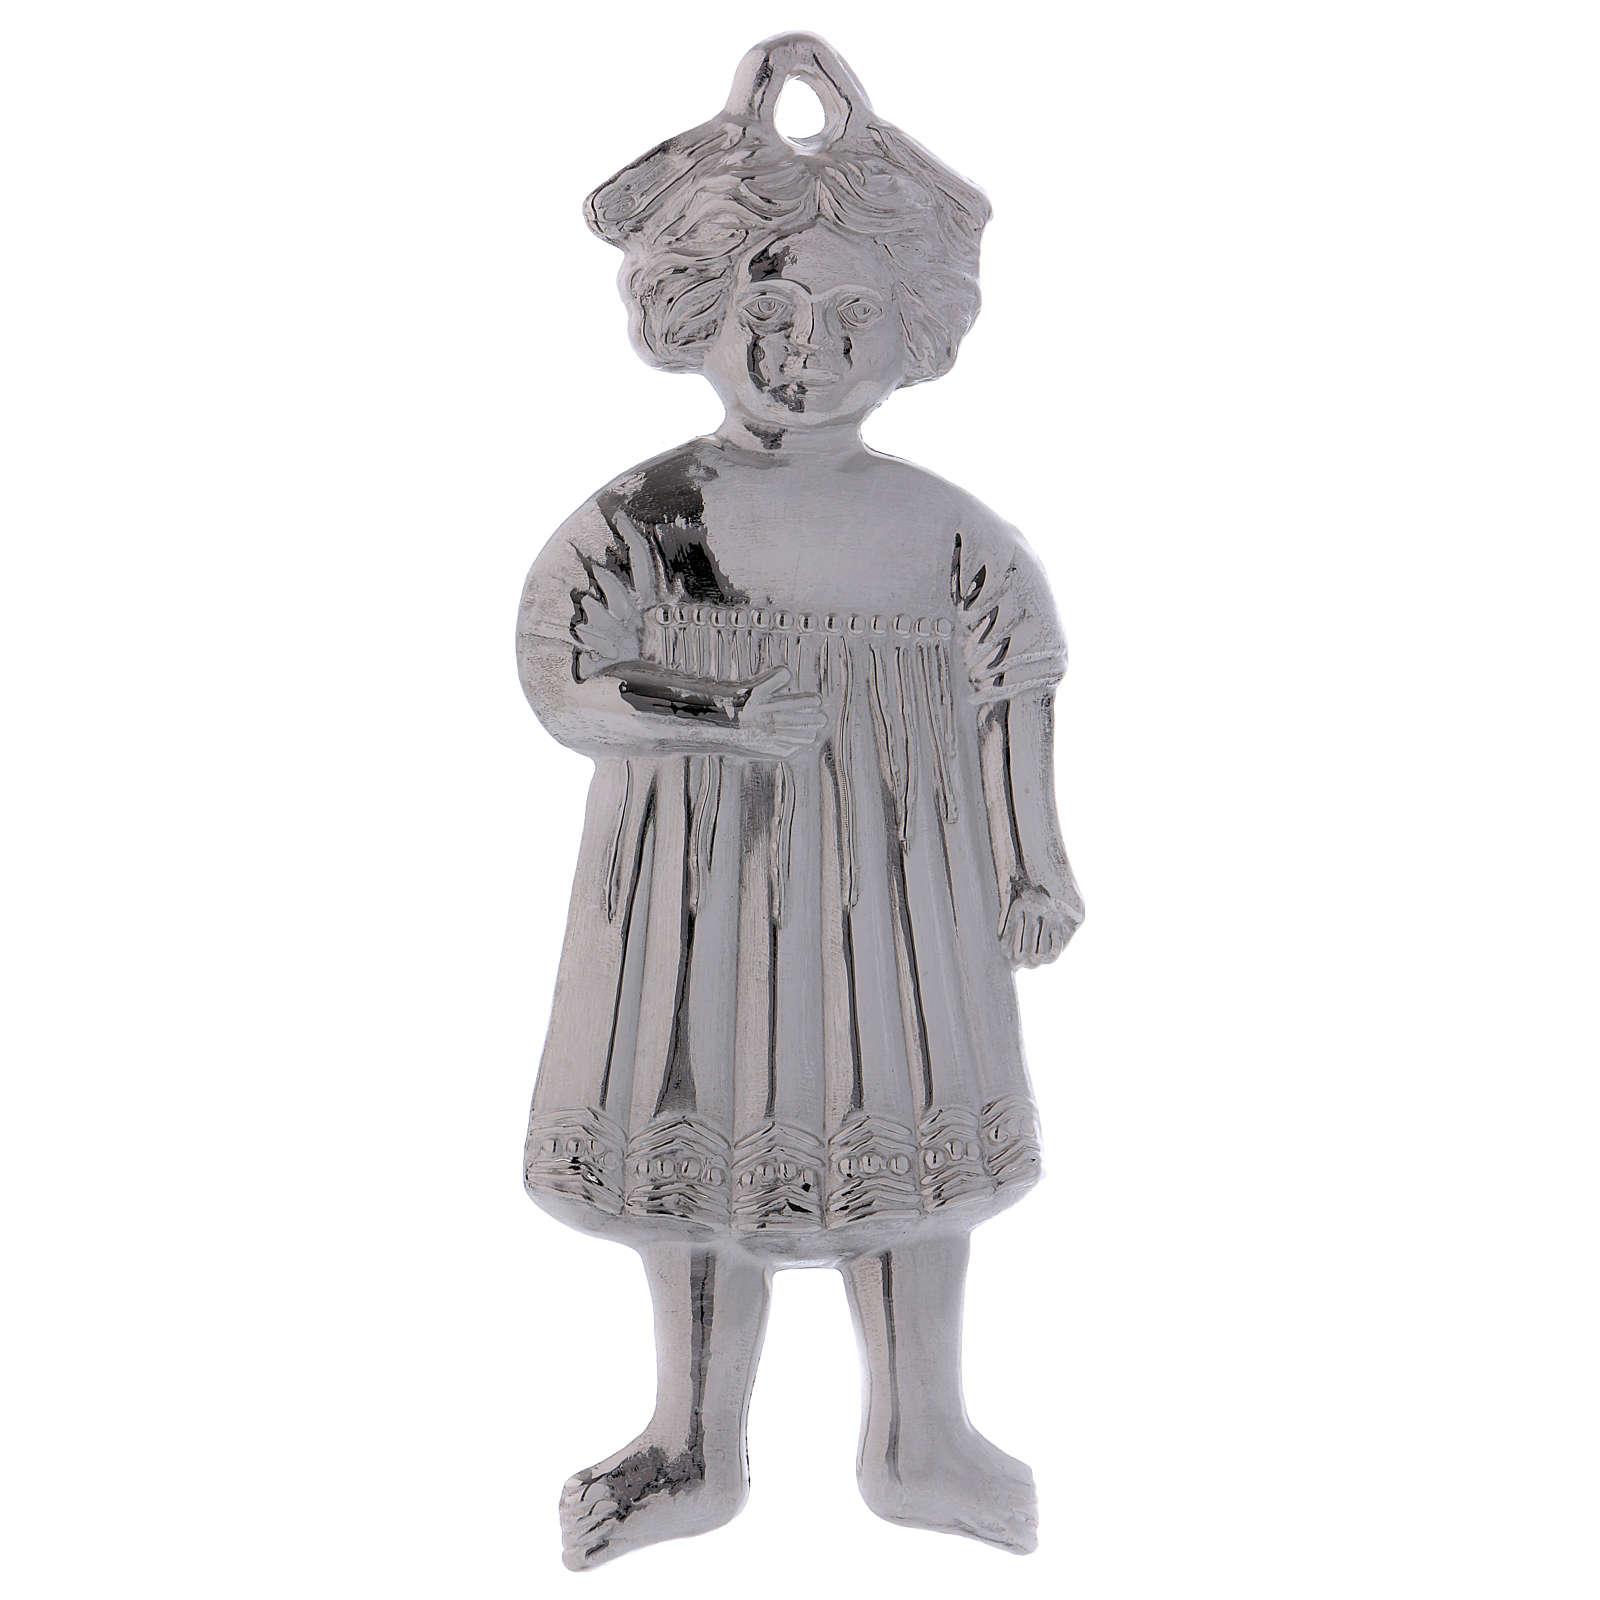 Ex-voto menina de pé prata 925 ou metal 13 cm 3